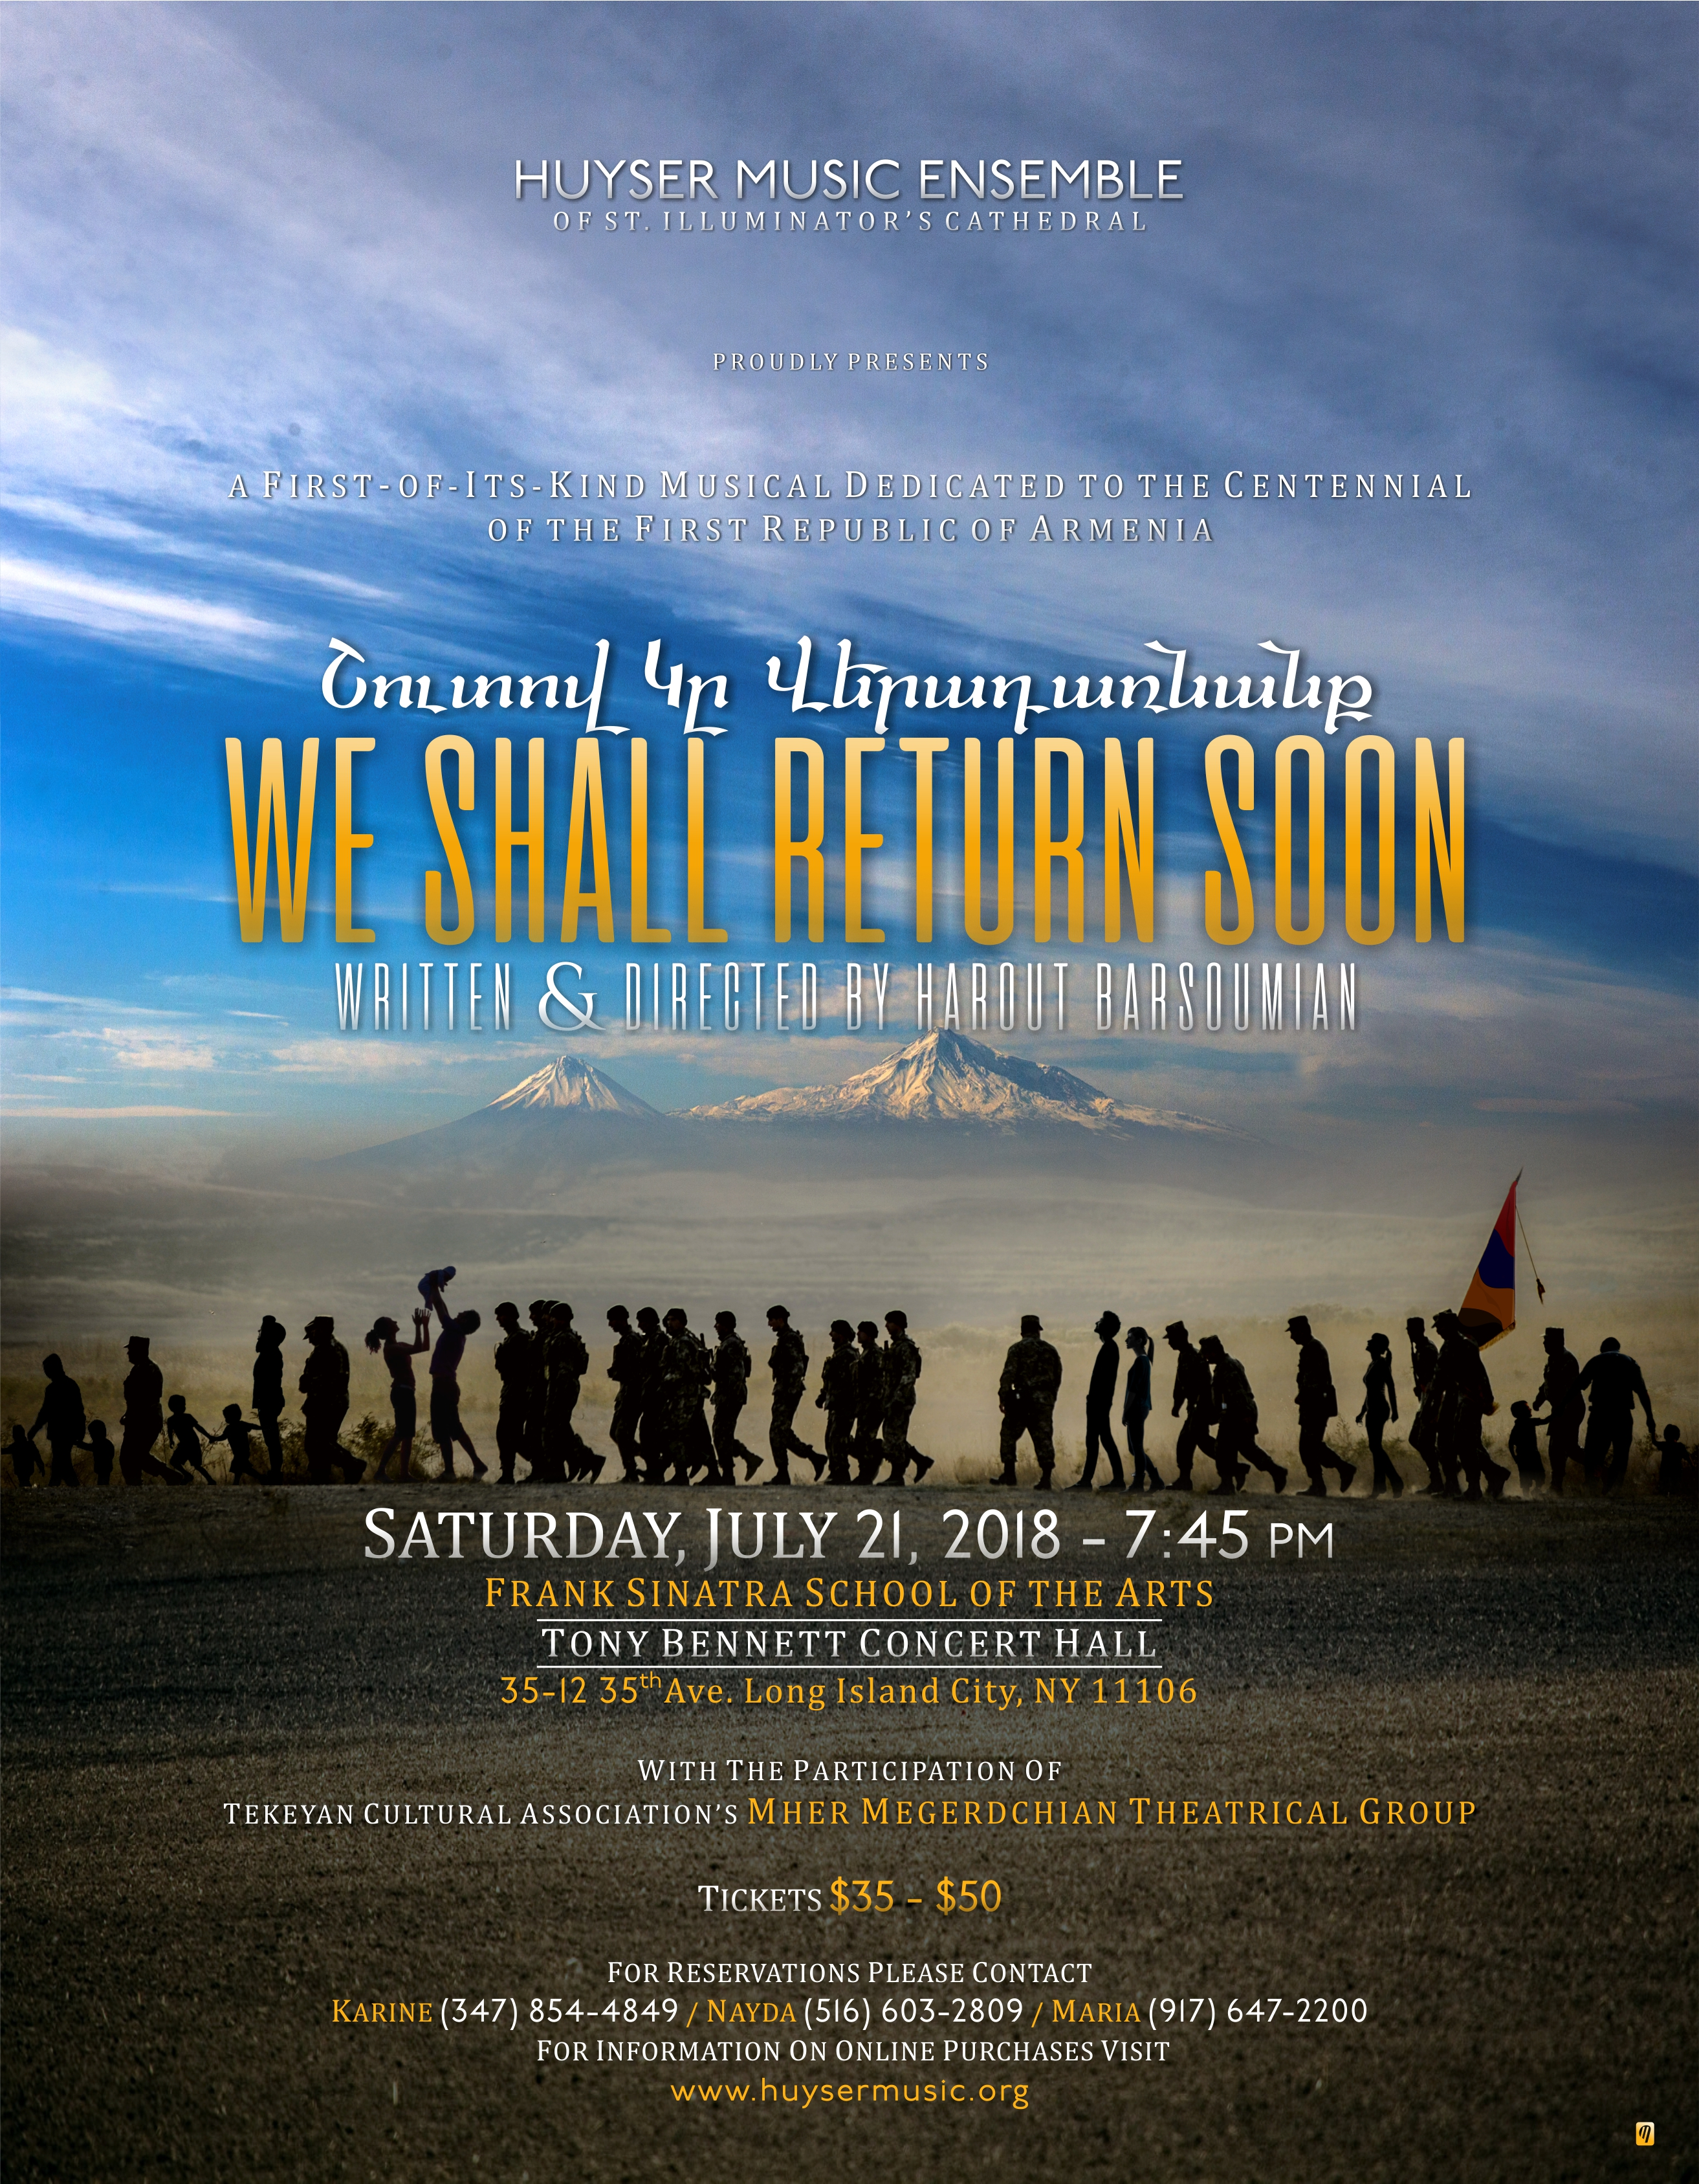 We-Shall-Return-Soon-flyer-1